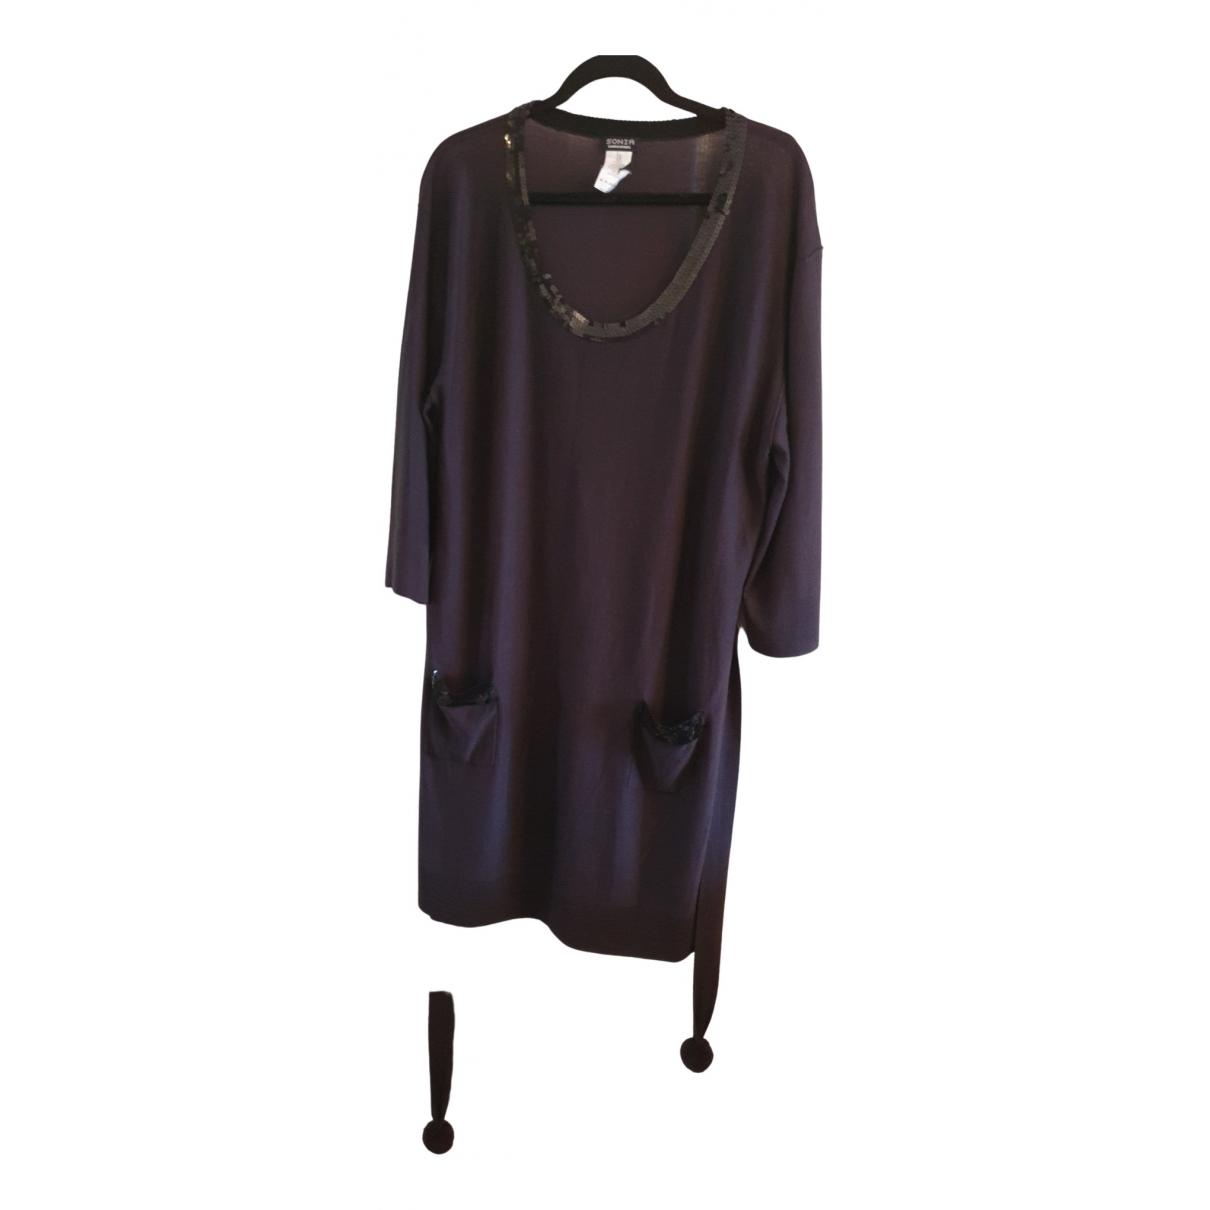 Sonia By Sonia Rykiel - Pull   pour femme en laine - violet